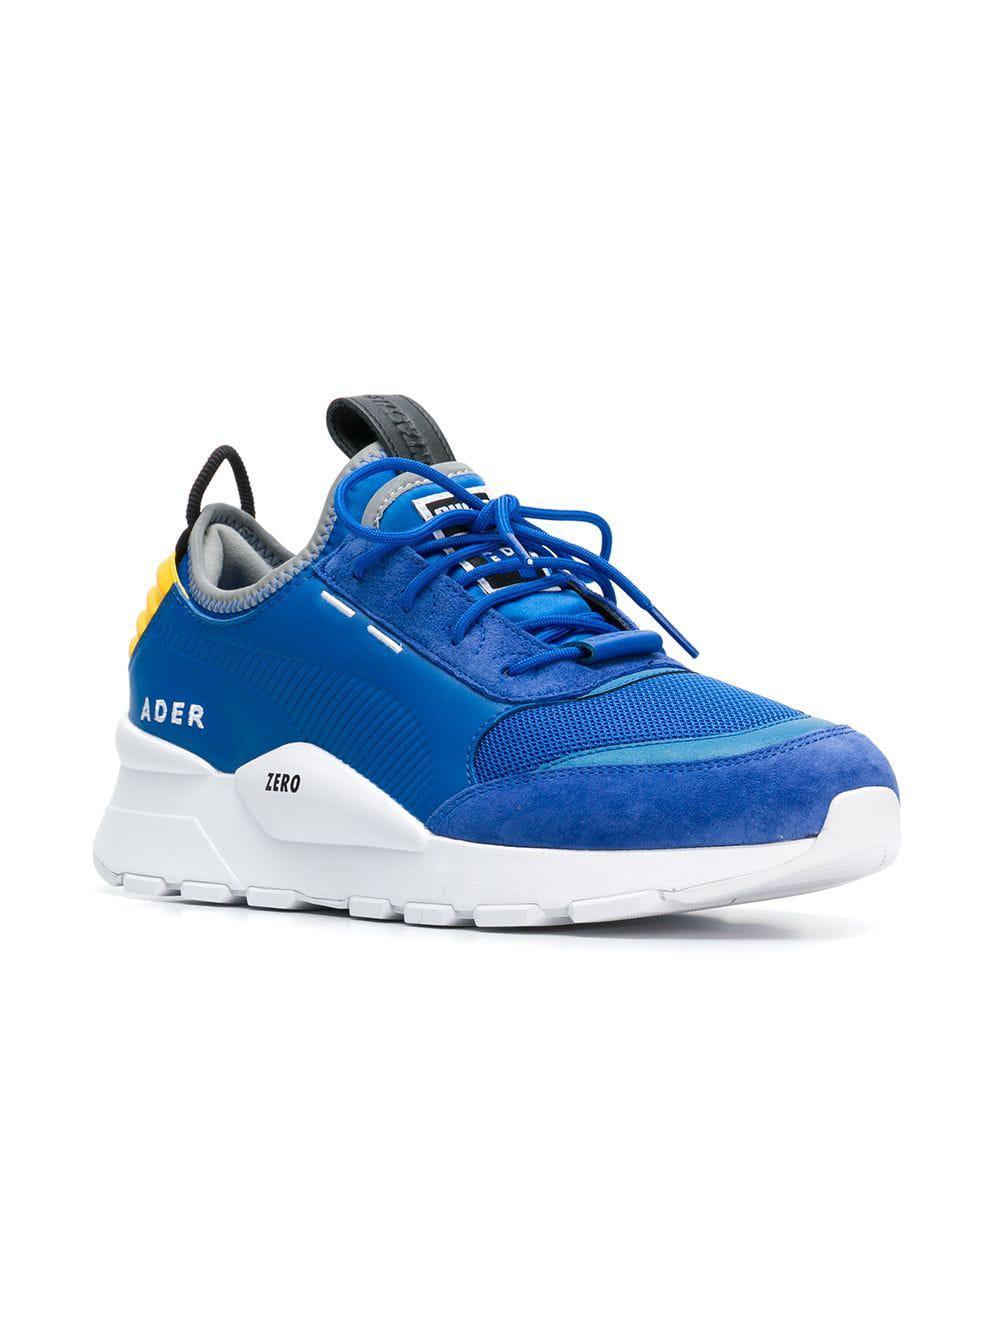 fe36b3d21dc499 ... Ader Error Leather Trainer Sneakers for Men - Lyst. View fullscreen